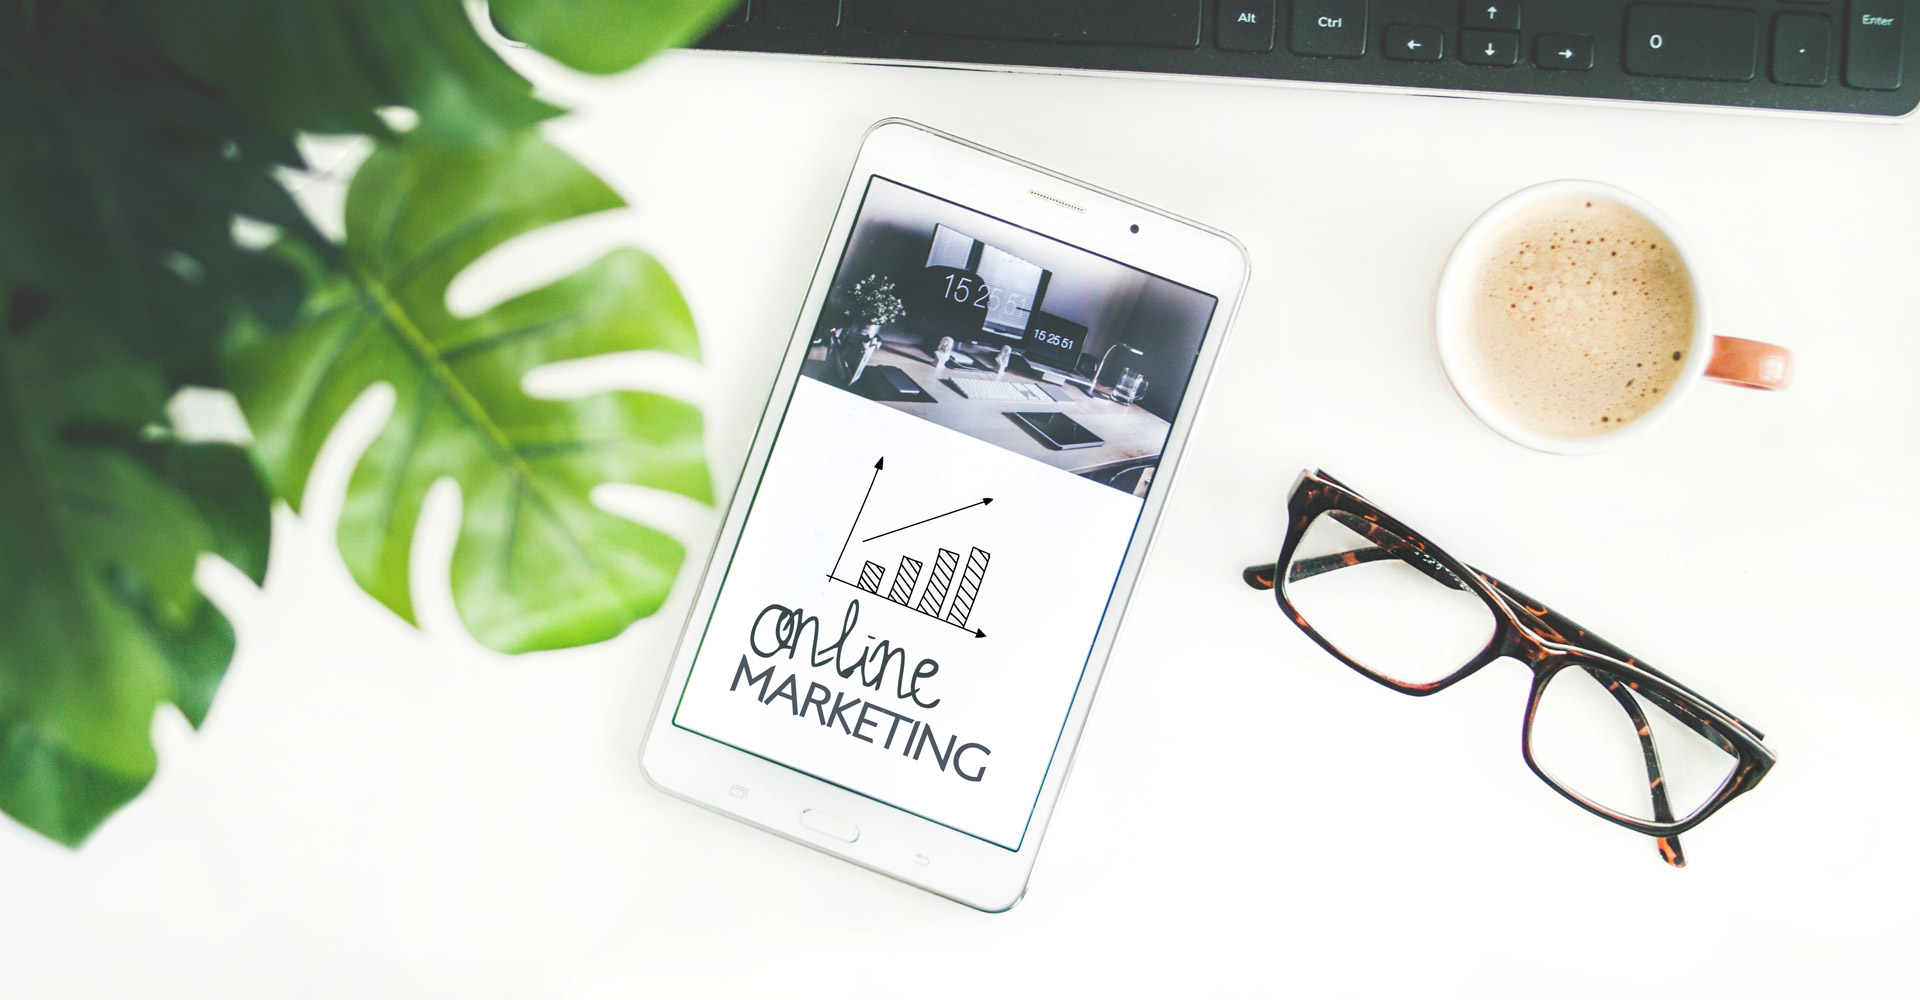 Digital Marketing services from Fifteen IT Ltd